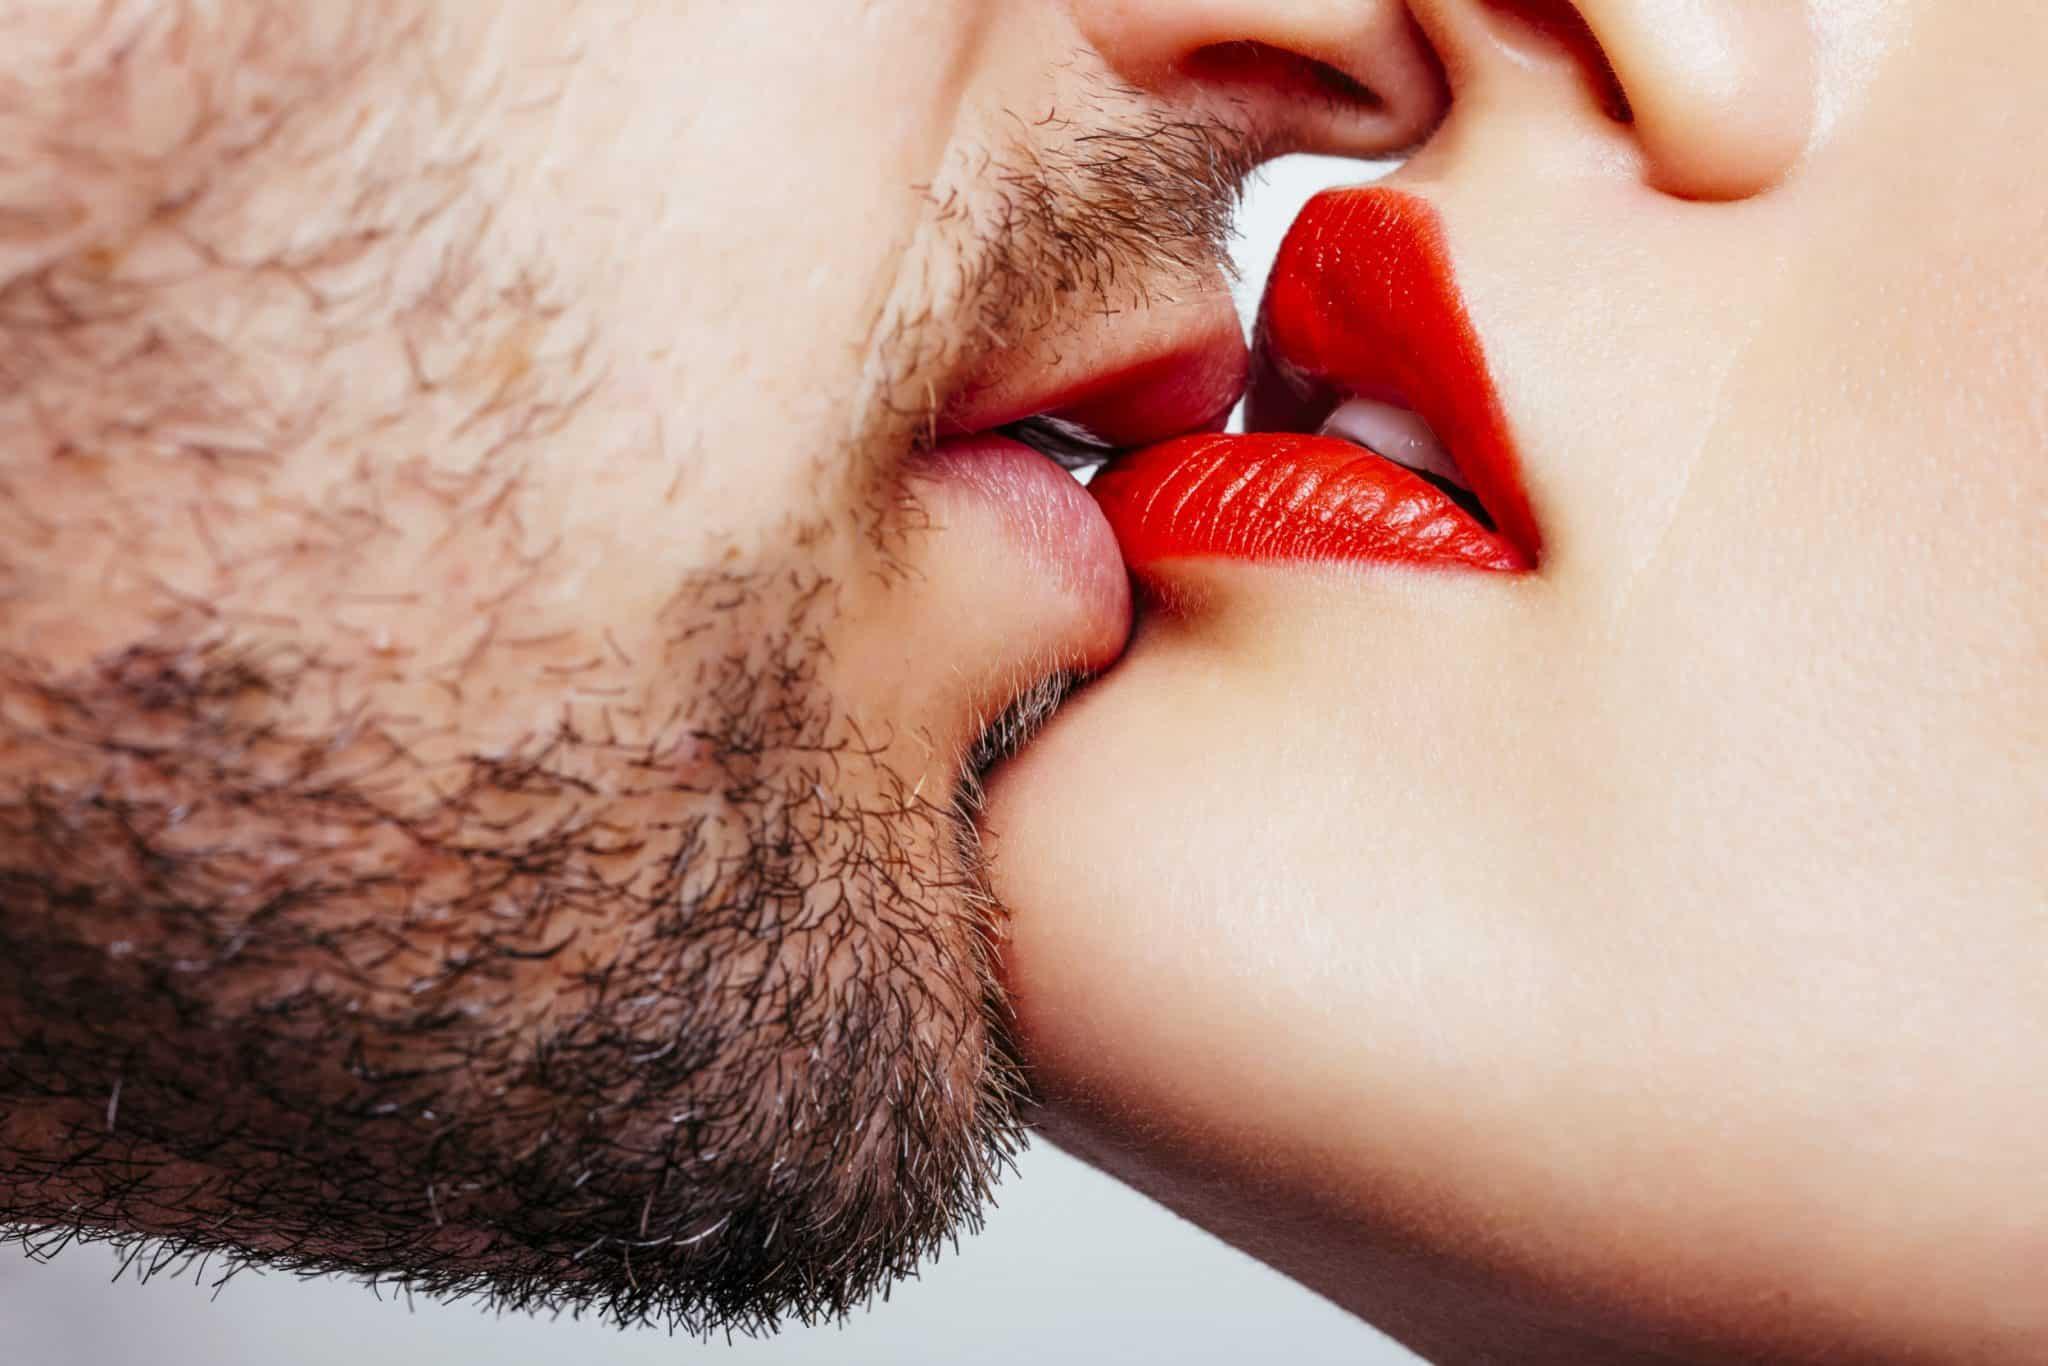 , Women's Sexual Services, Mirza Aesthetics